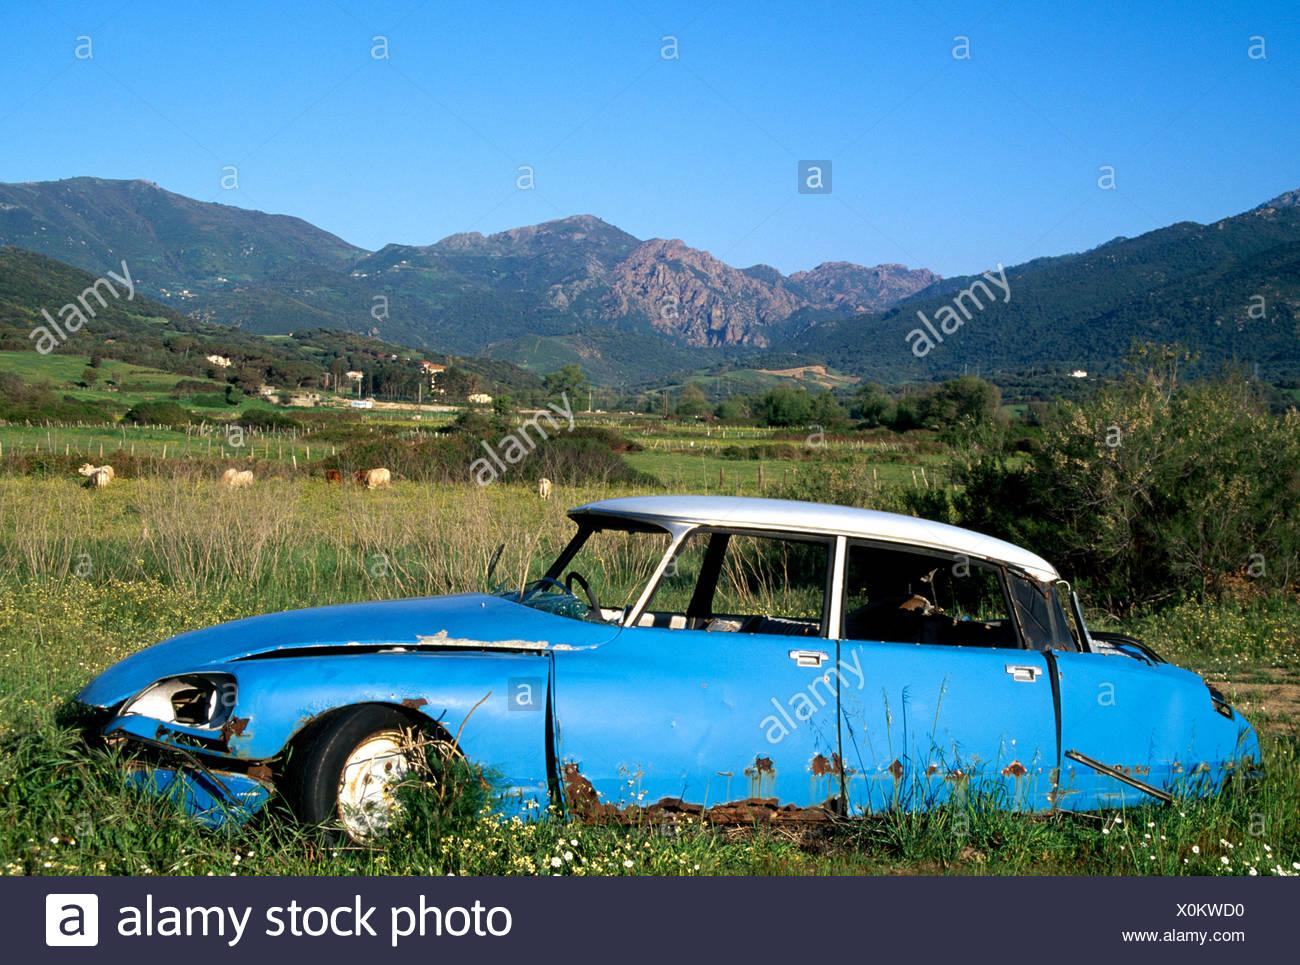 Car wreck, Citroen, Saint Florent, Corsica, France, Europe Stock Photo